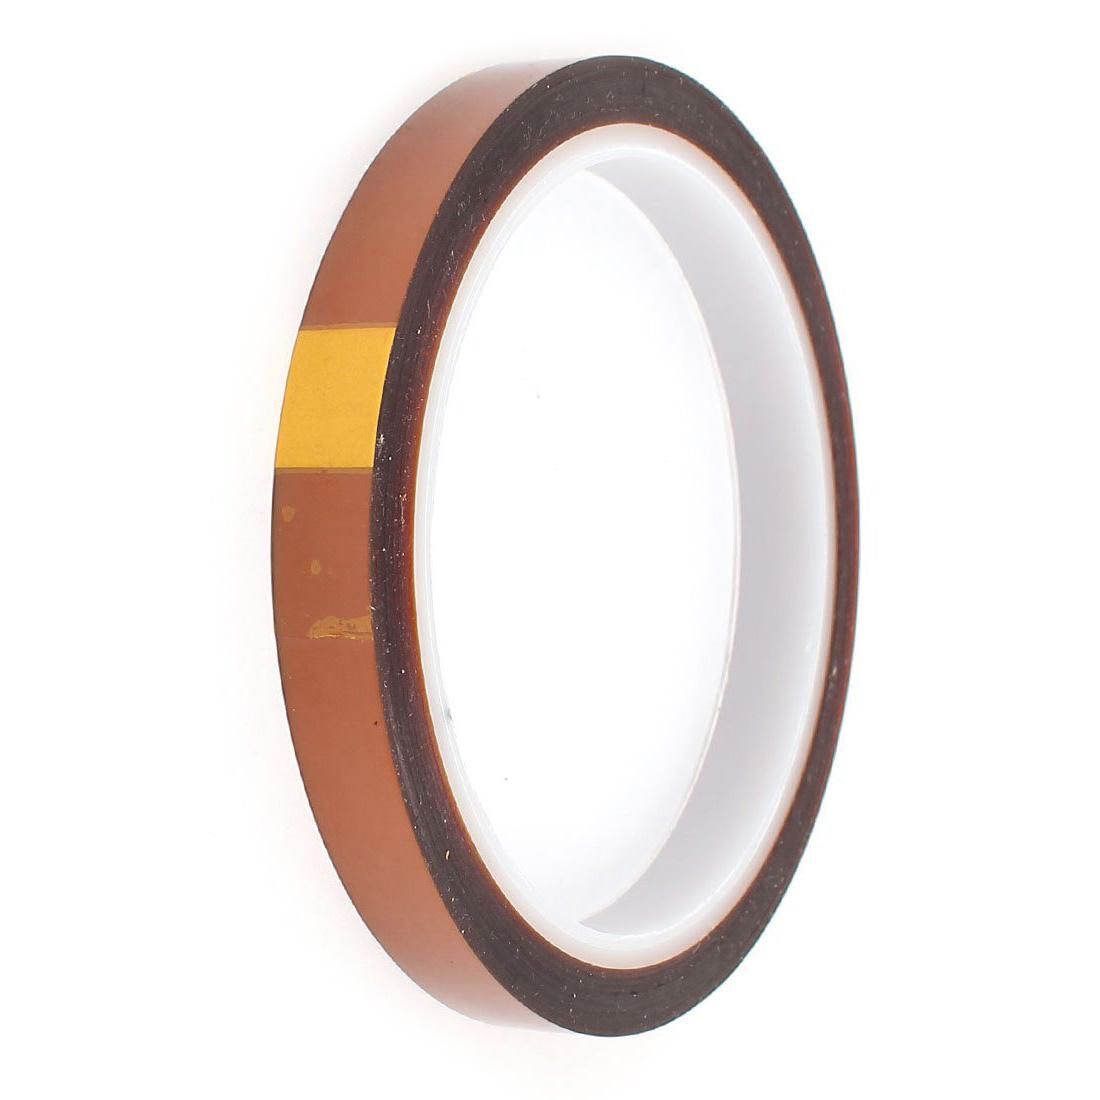 10 mm breite hitzebestaendiges hochtemperaturkleber klebeband gn a2l0 ebay. Black Bedroom Furniture Sets. Home Design Ideas